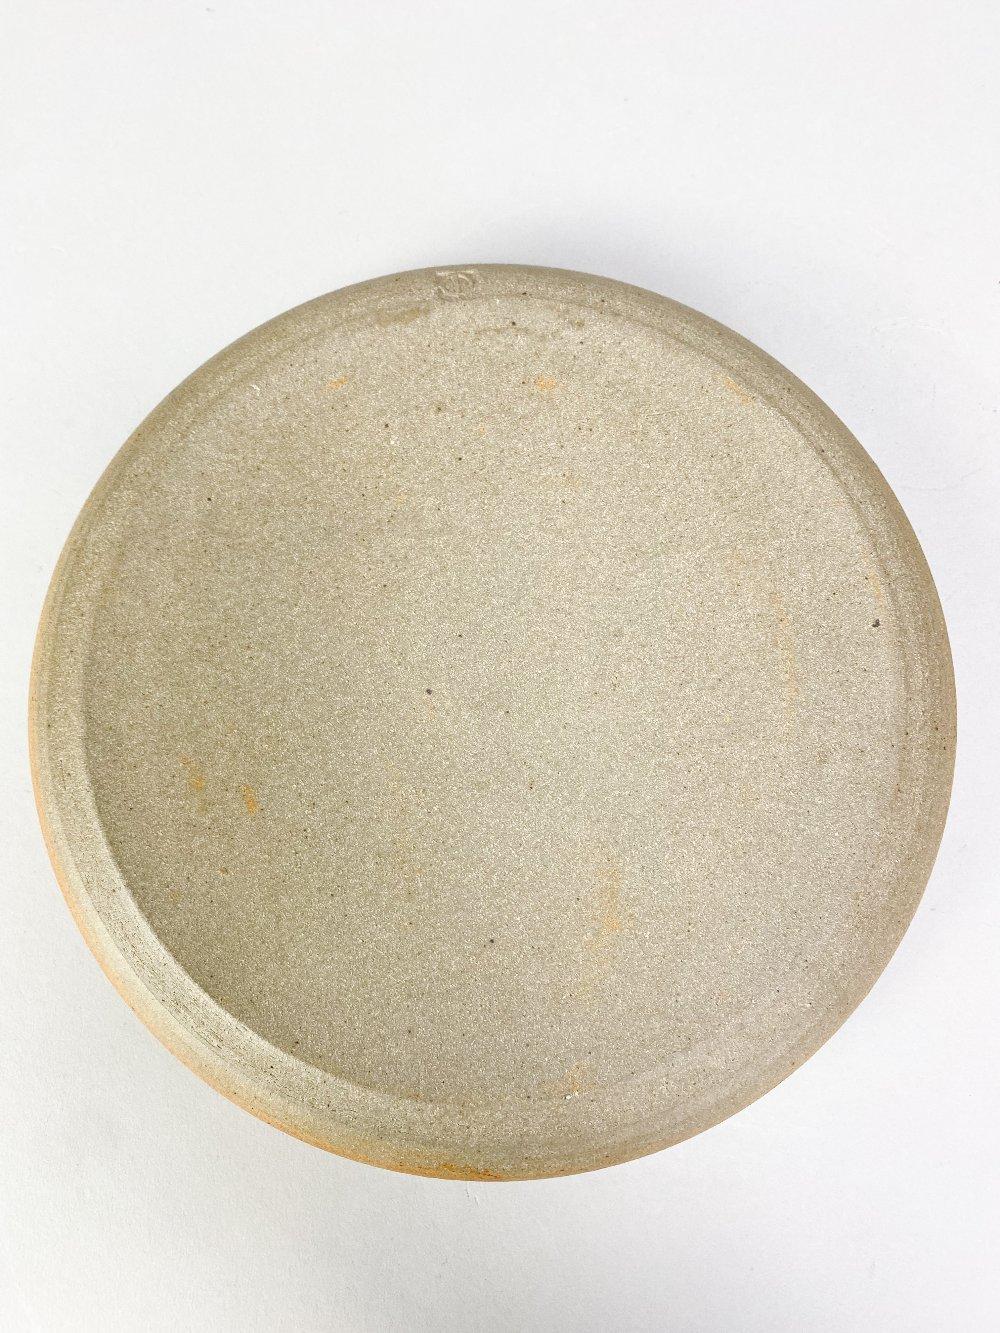 COLIN PEARSON (1923-2007); a stoneware coffee pot with shino topand a stoneware dish, impressed - Image 4 of 7